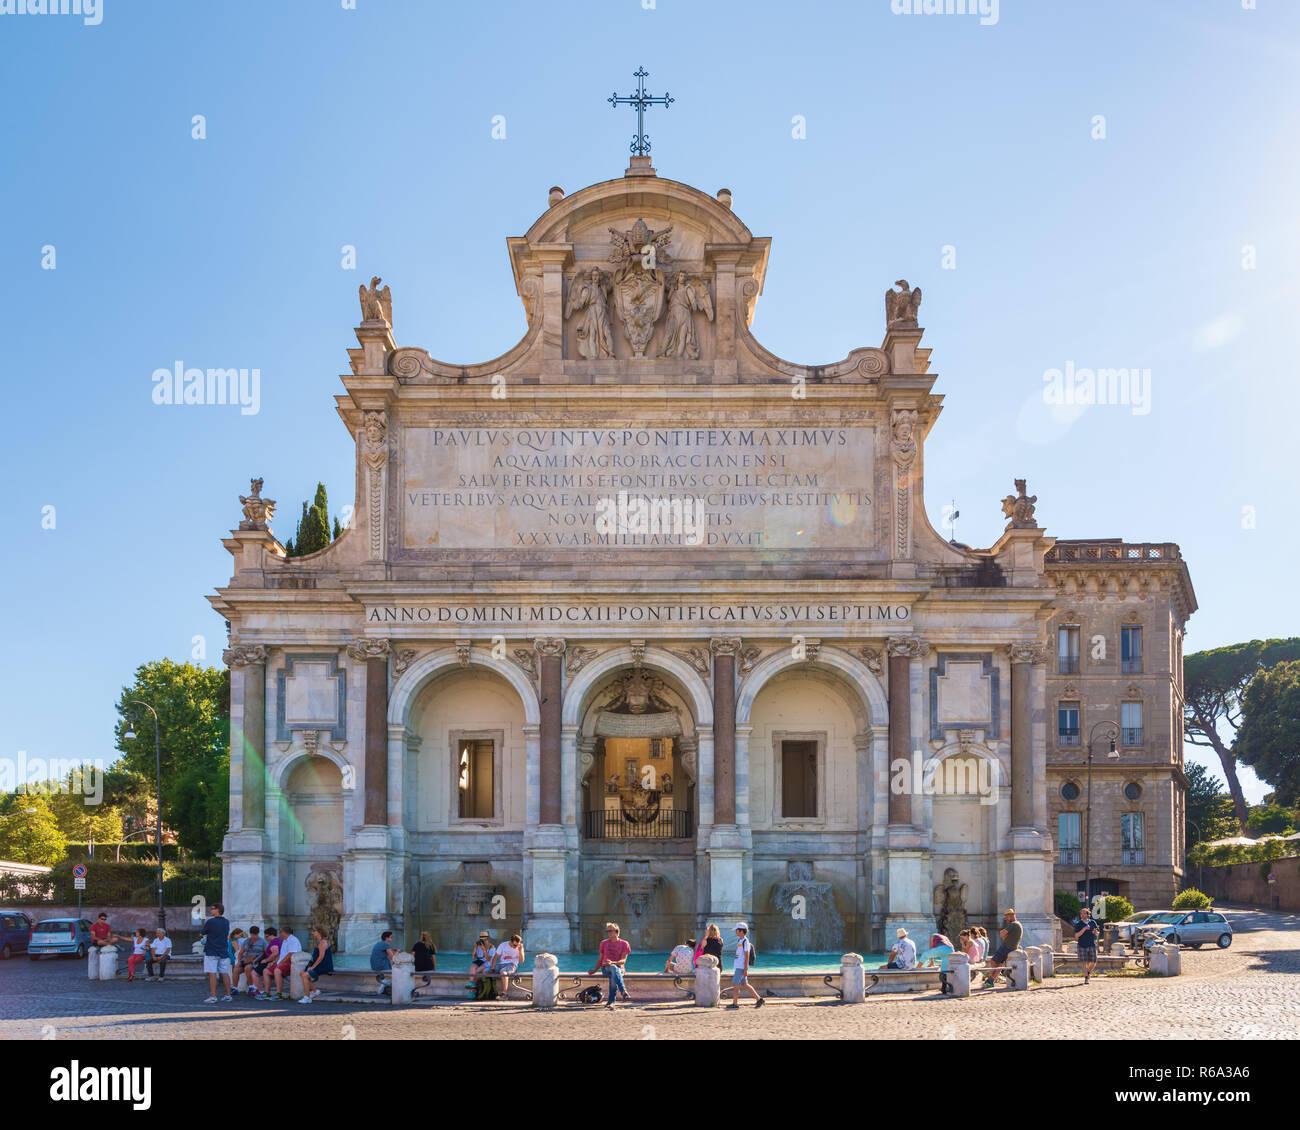 Fontana dell'Acqua Paola, Gianicolo, Rome, Italie Banque D'Images